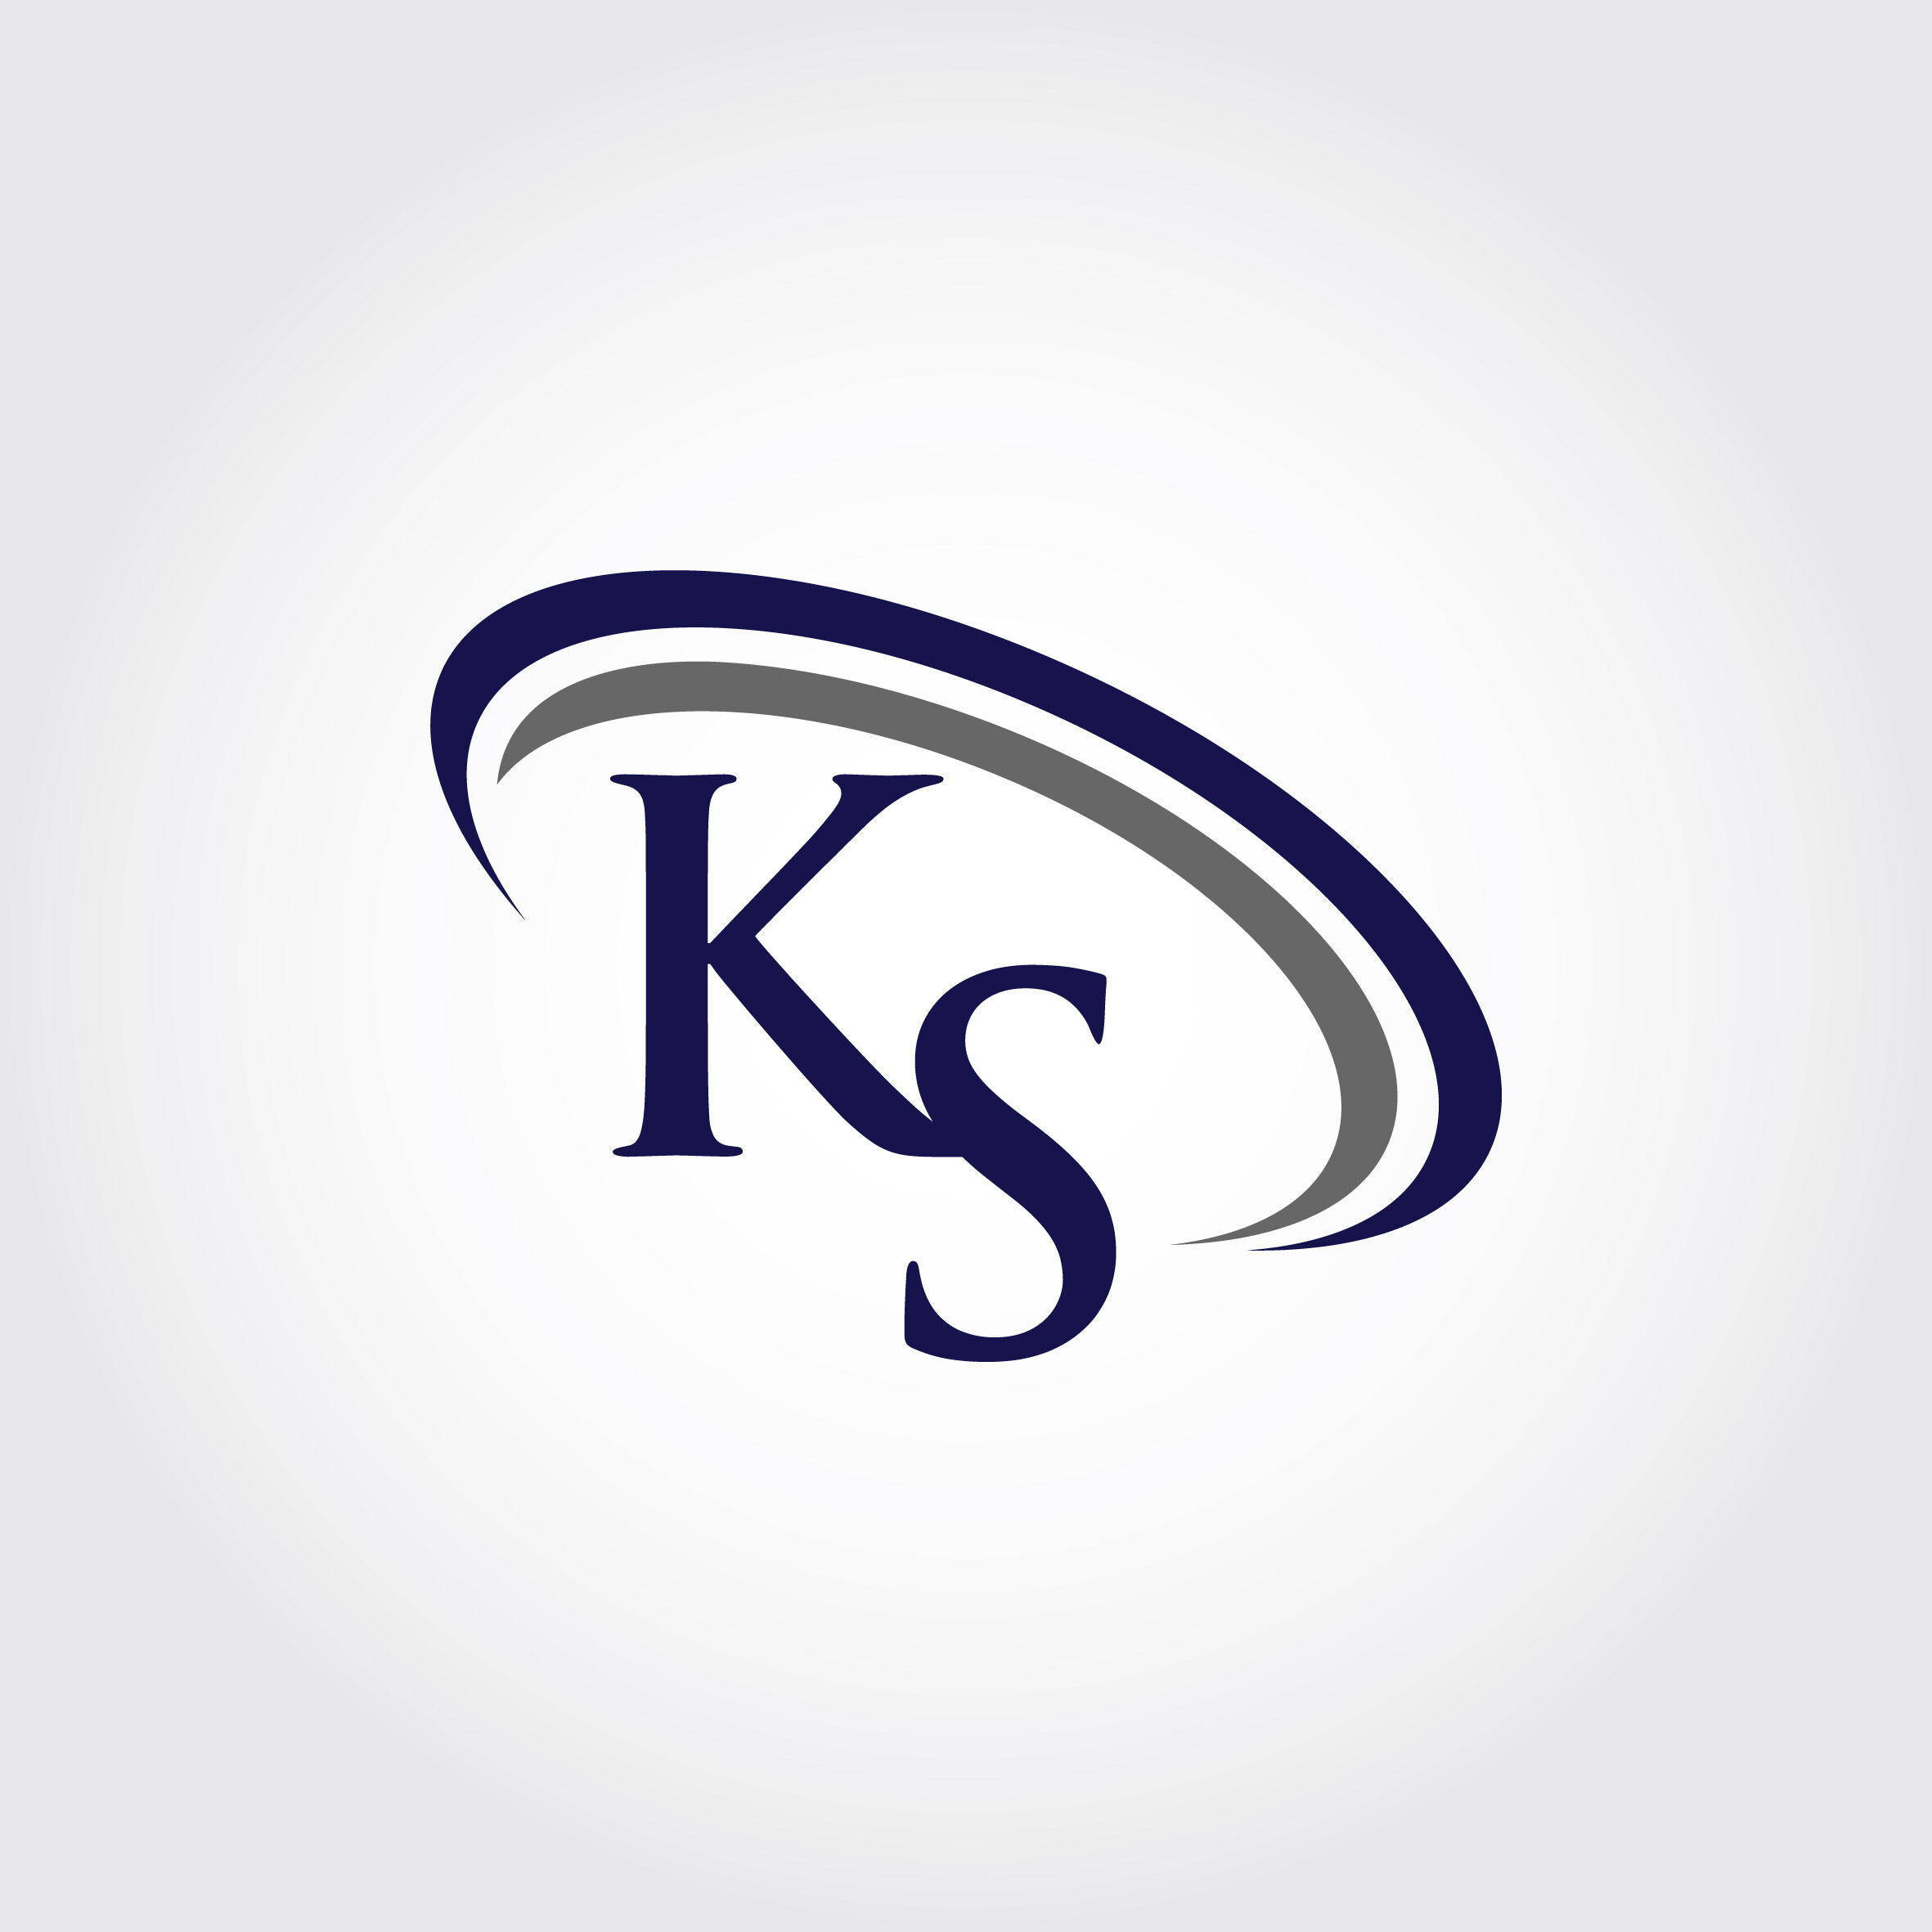 monogram ks logo design by vectorseller thehungryjpeg com monogram ks logo design by vectorseller